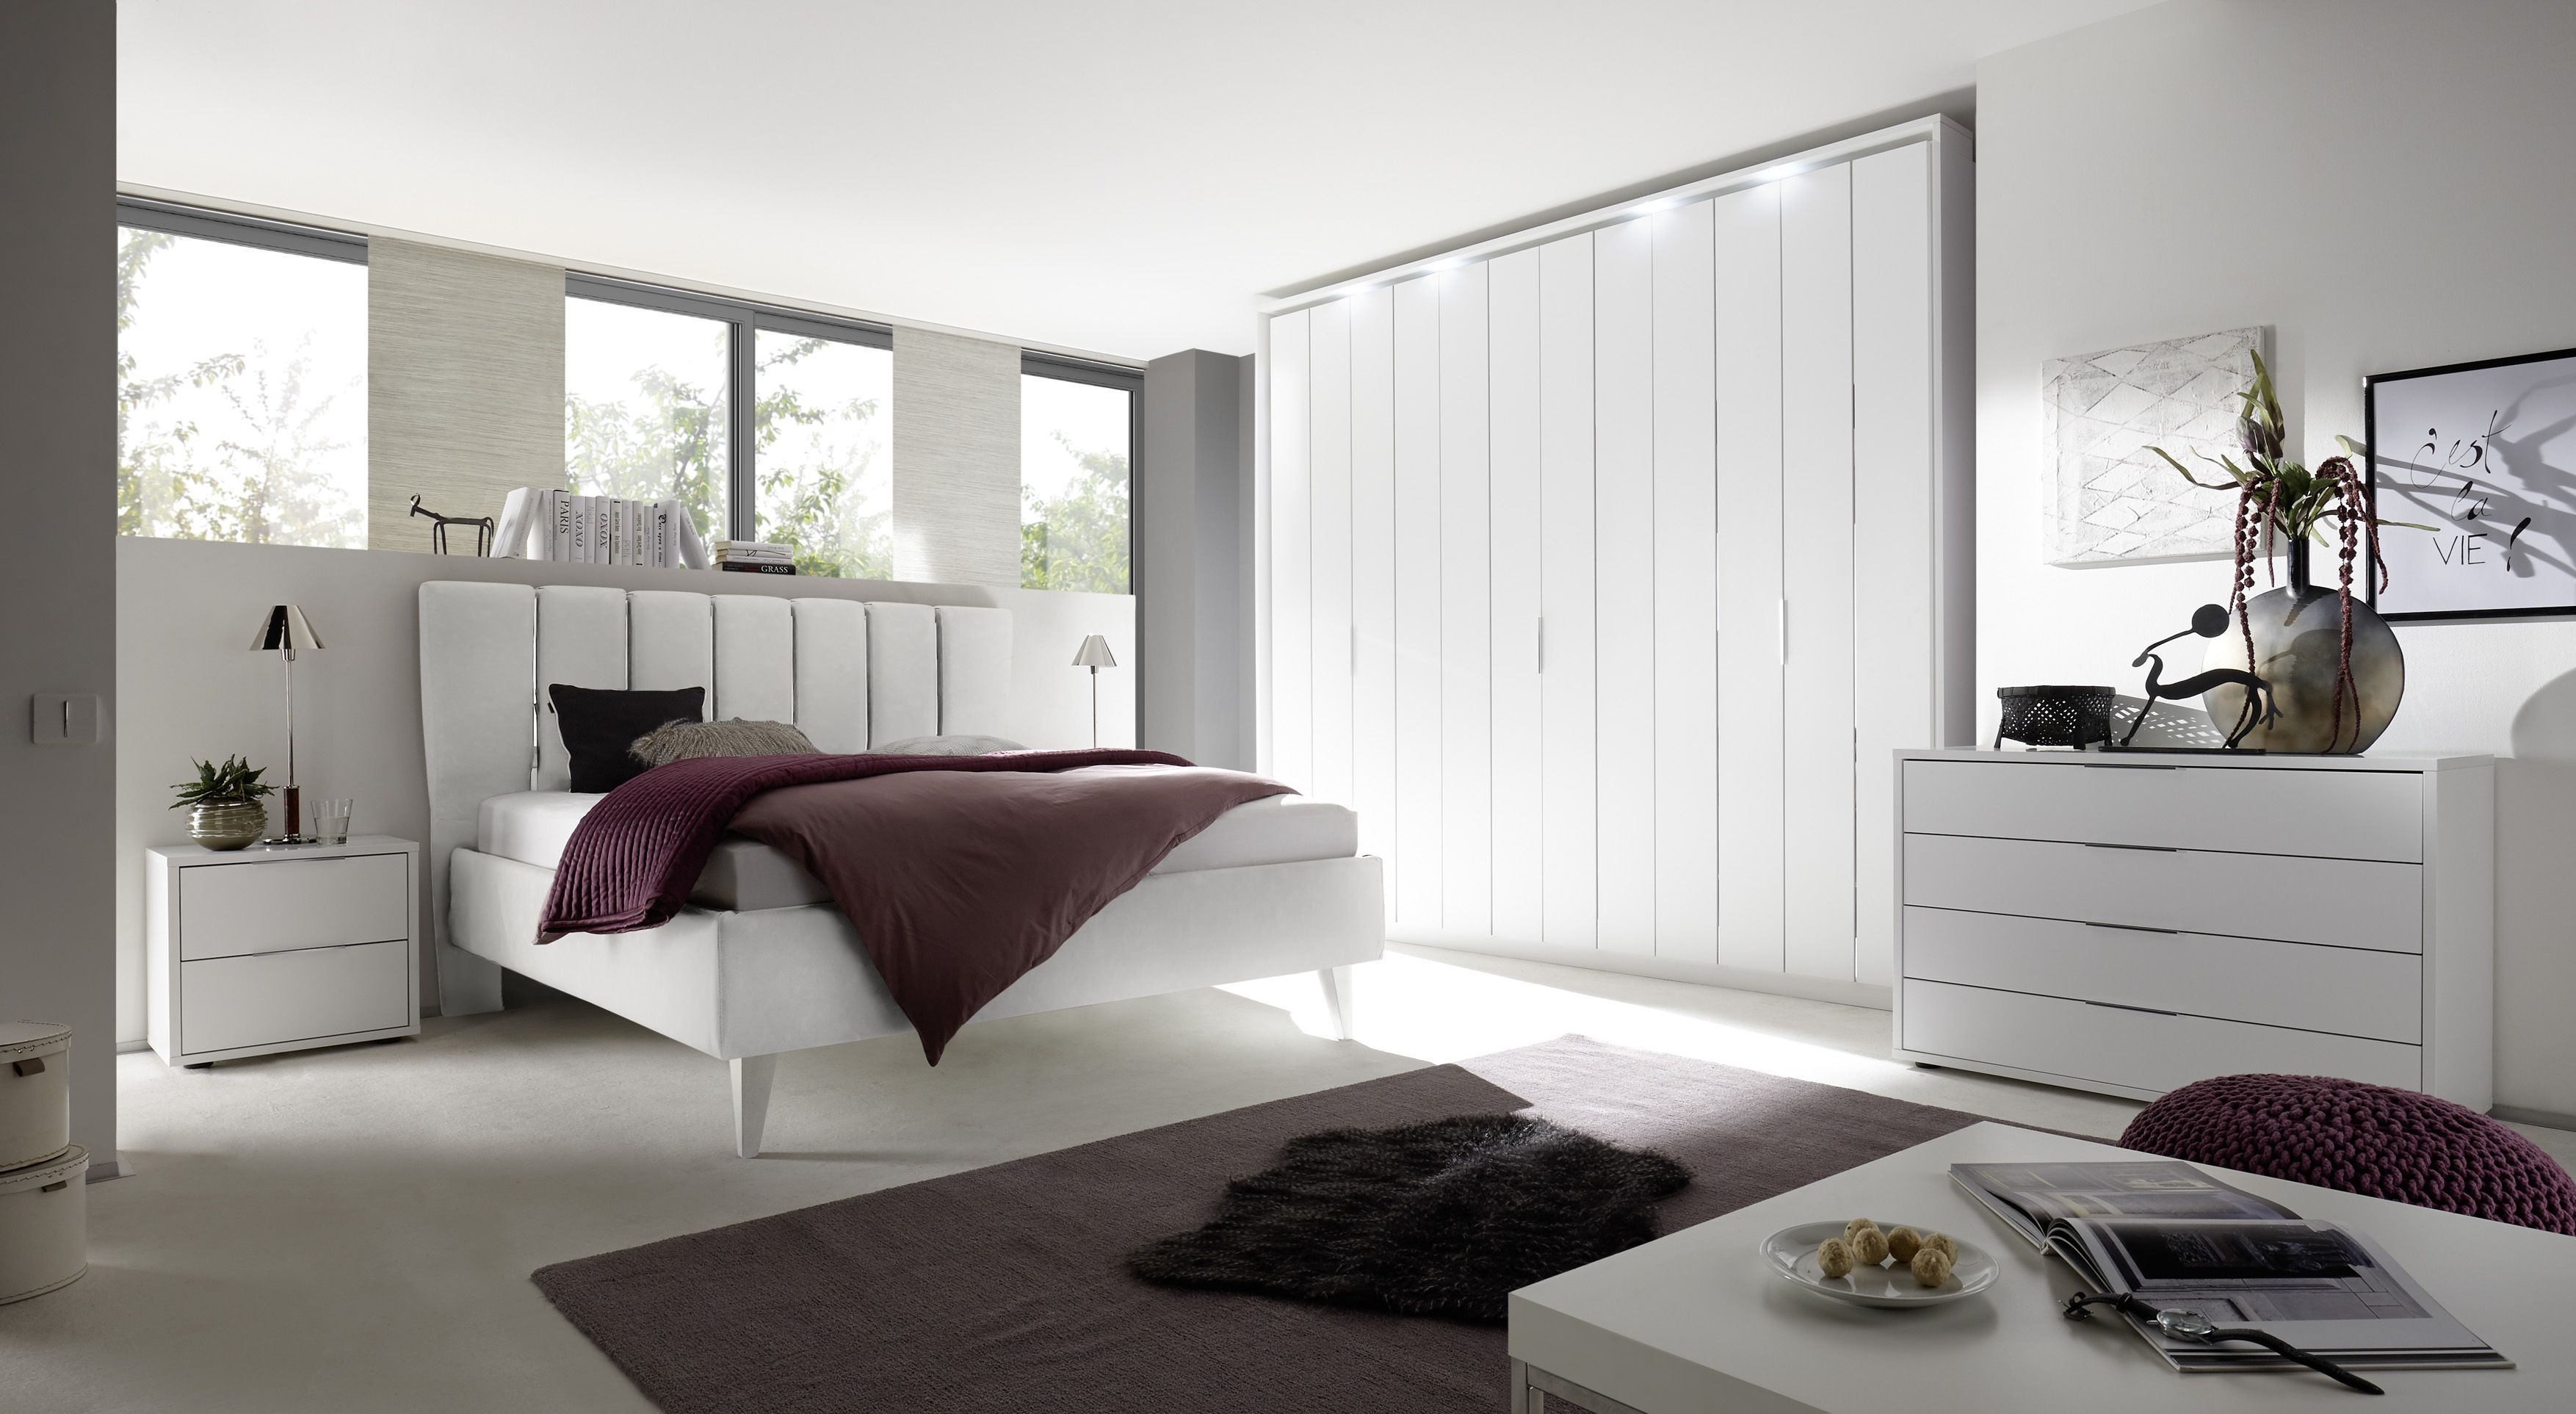 Schlafzimmer Mit Bett 180 X 200 Cm Weiss Matt Lackiert